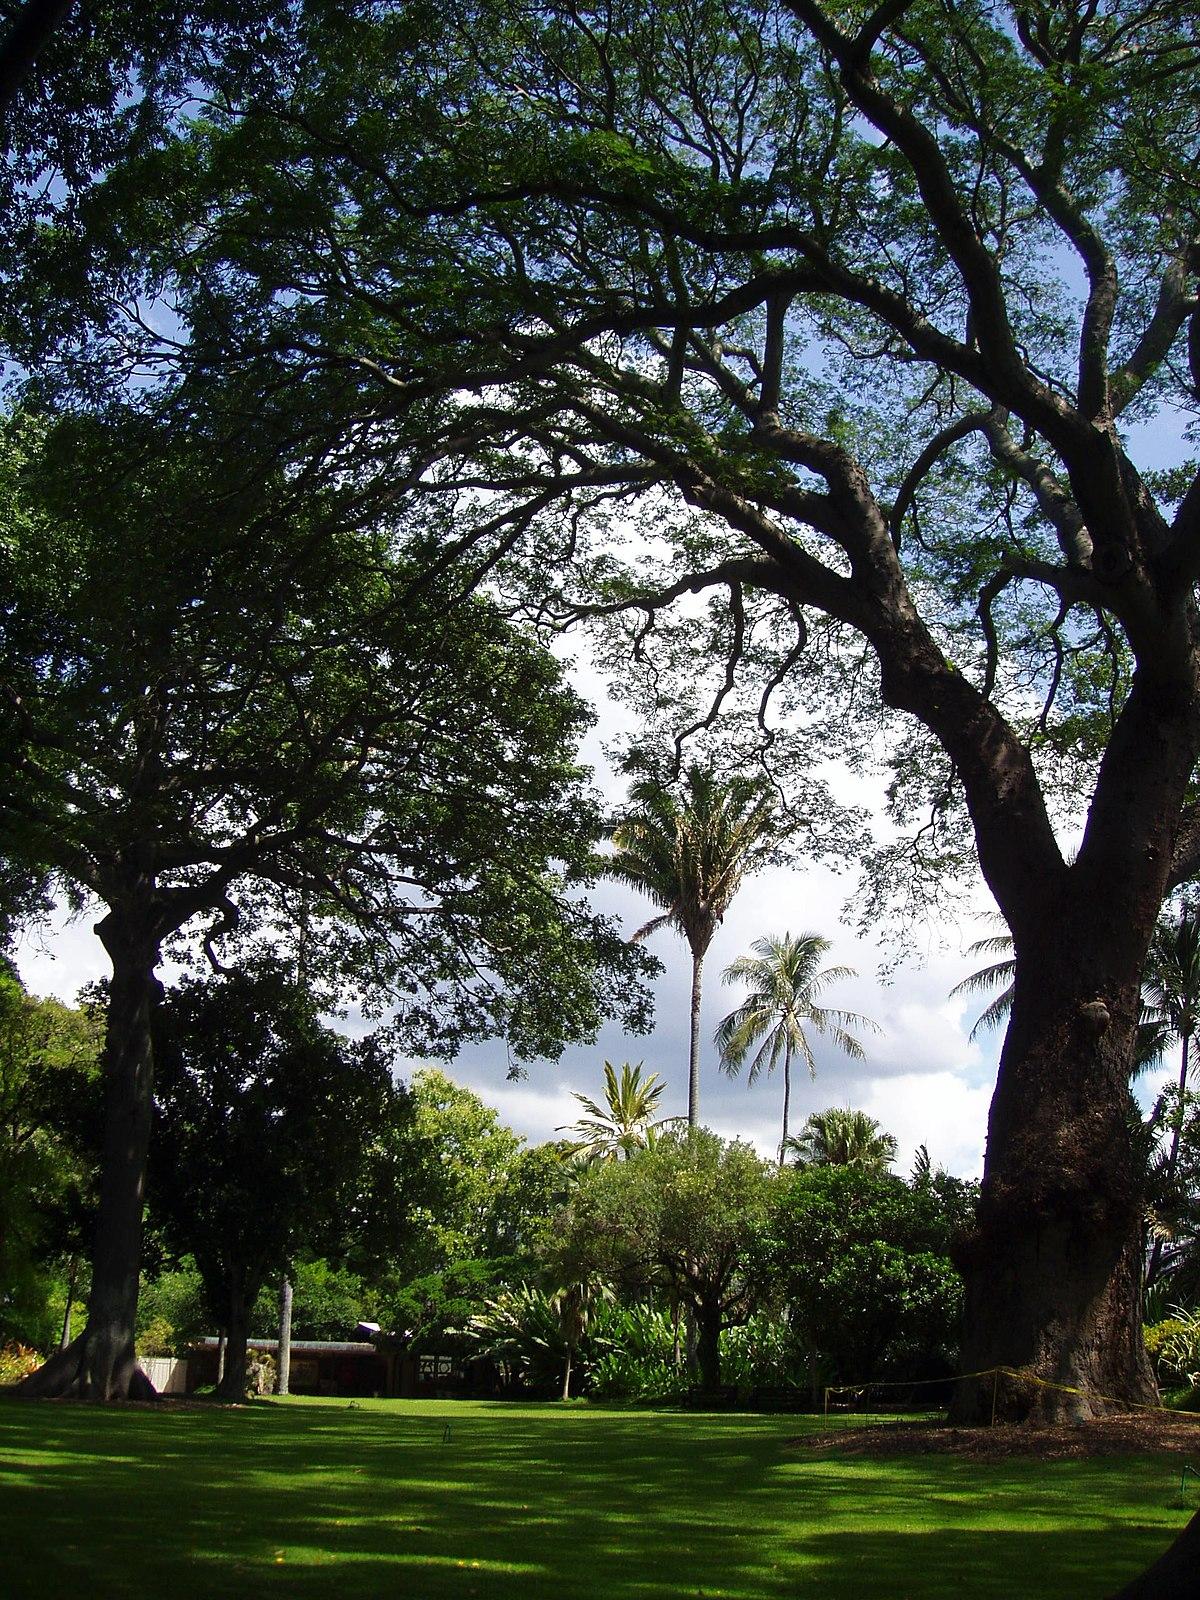 foster botanical garden wikipedia ForFoster Botanical Garden Honolulu